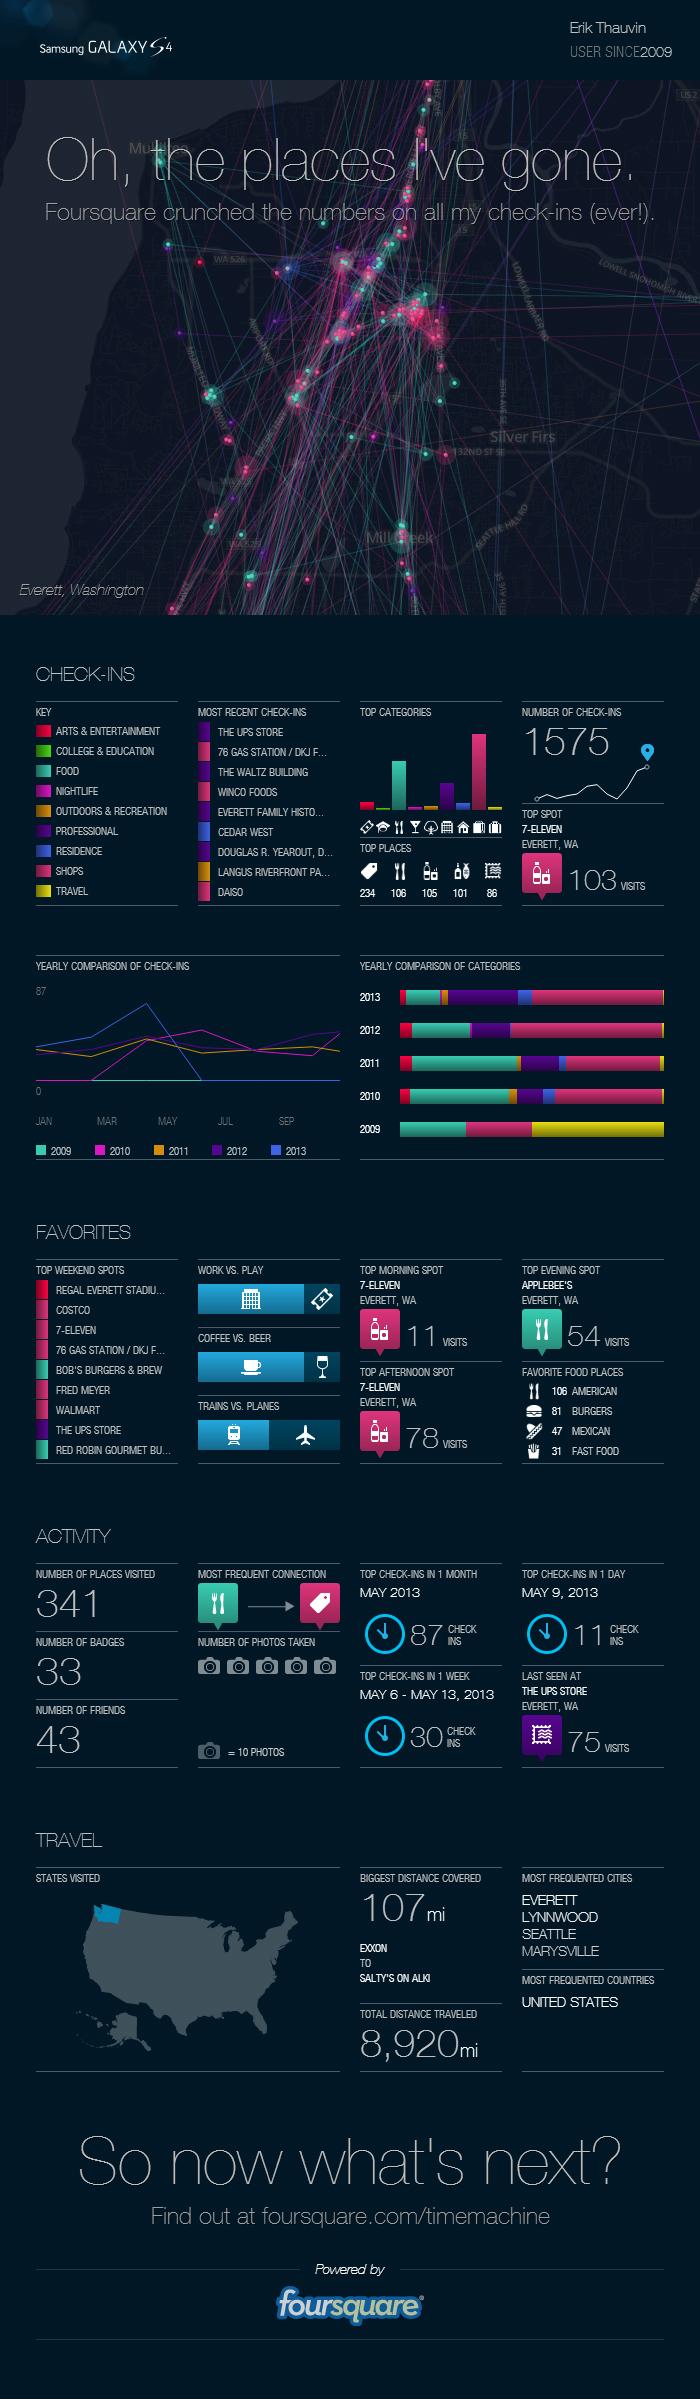 Foursquare Timeline